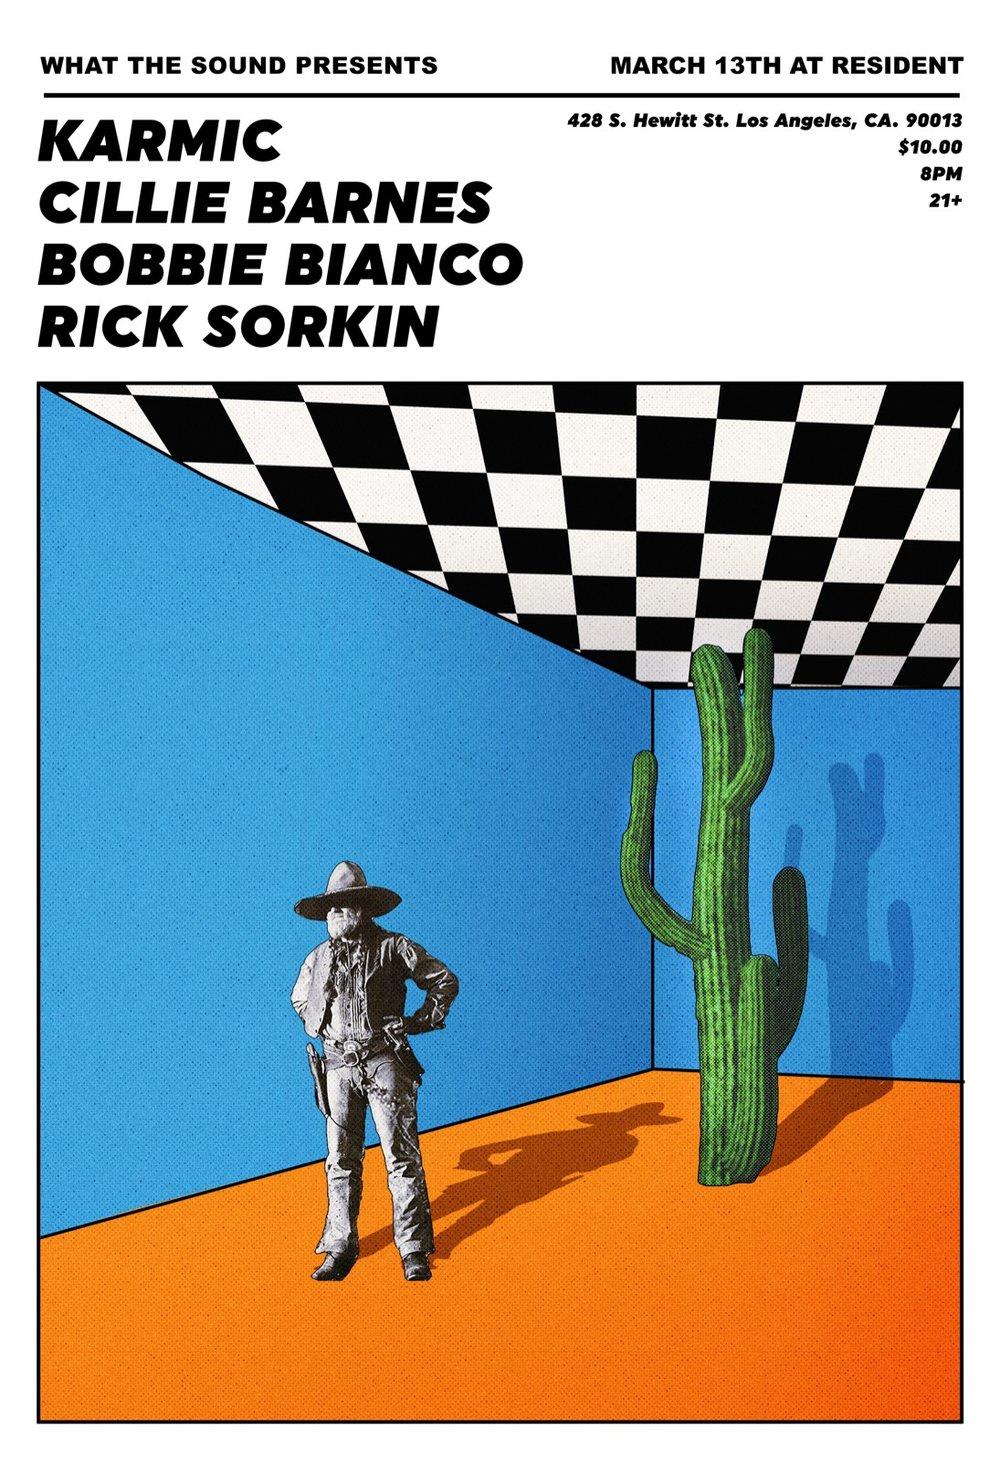 KARMIC / CILLIE BARNES / BOBBIE BIANCO / RICK SORKIN - Artwork by Patrick ElmoreMarch 13 @ Resident$10, 21+